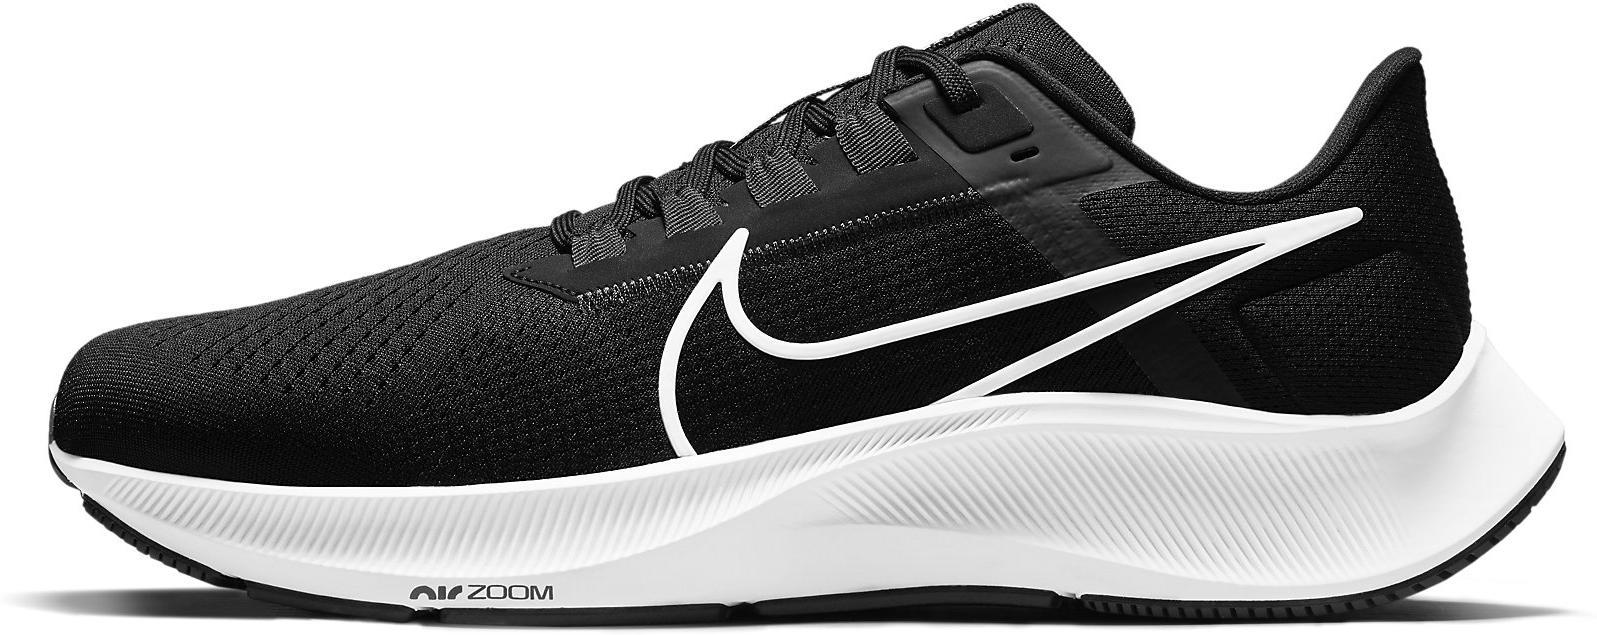 Scarpe da running Nike AIR ZOOM PEGASUS 38 4E